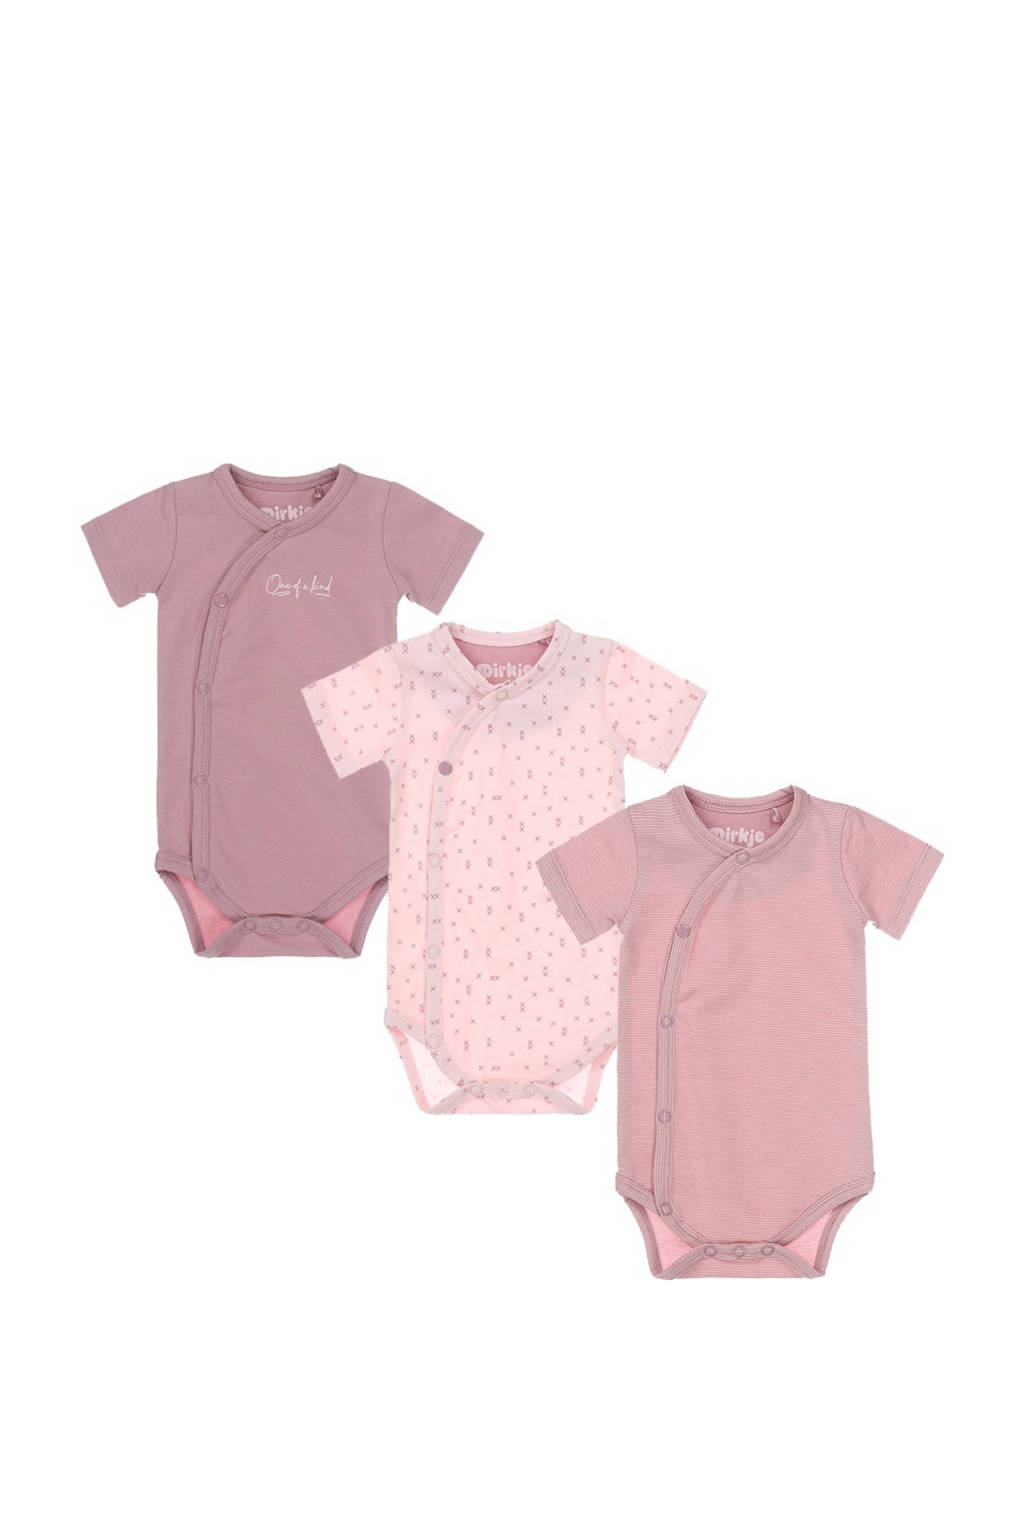 Dirkje newborn baby romper - set van 3 roze, Roze/lichtroze